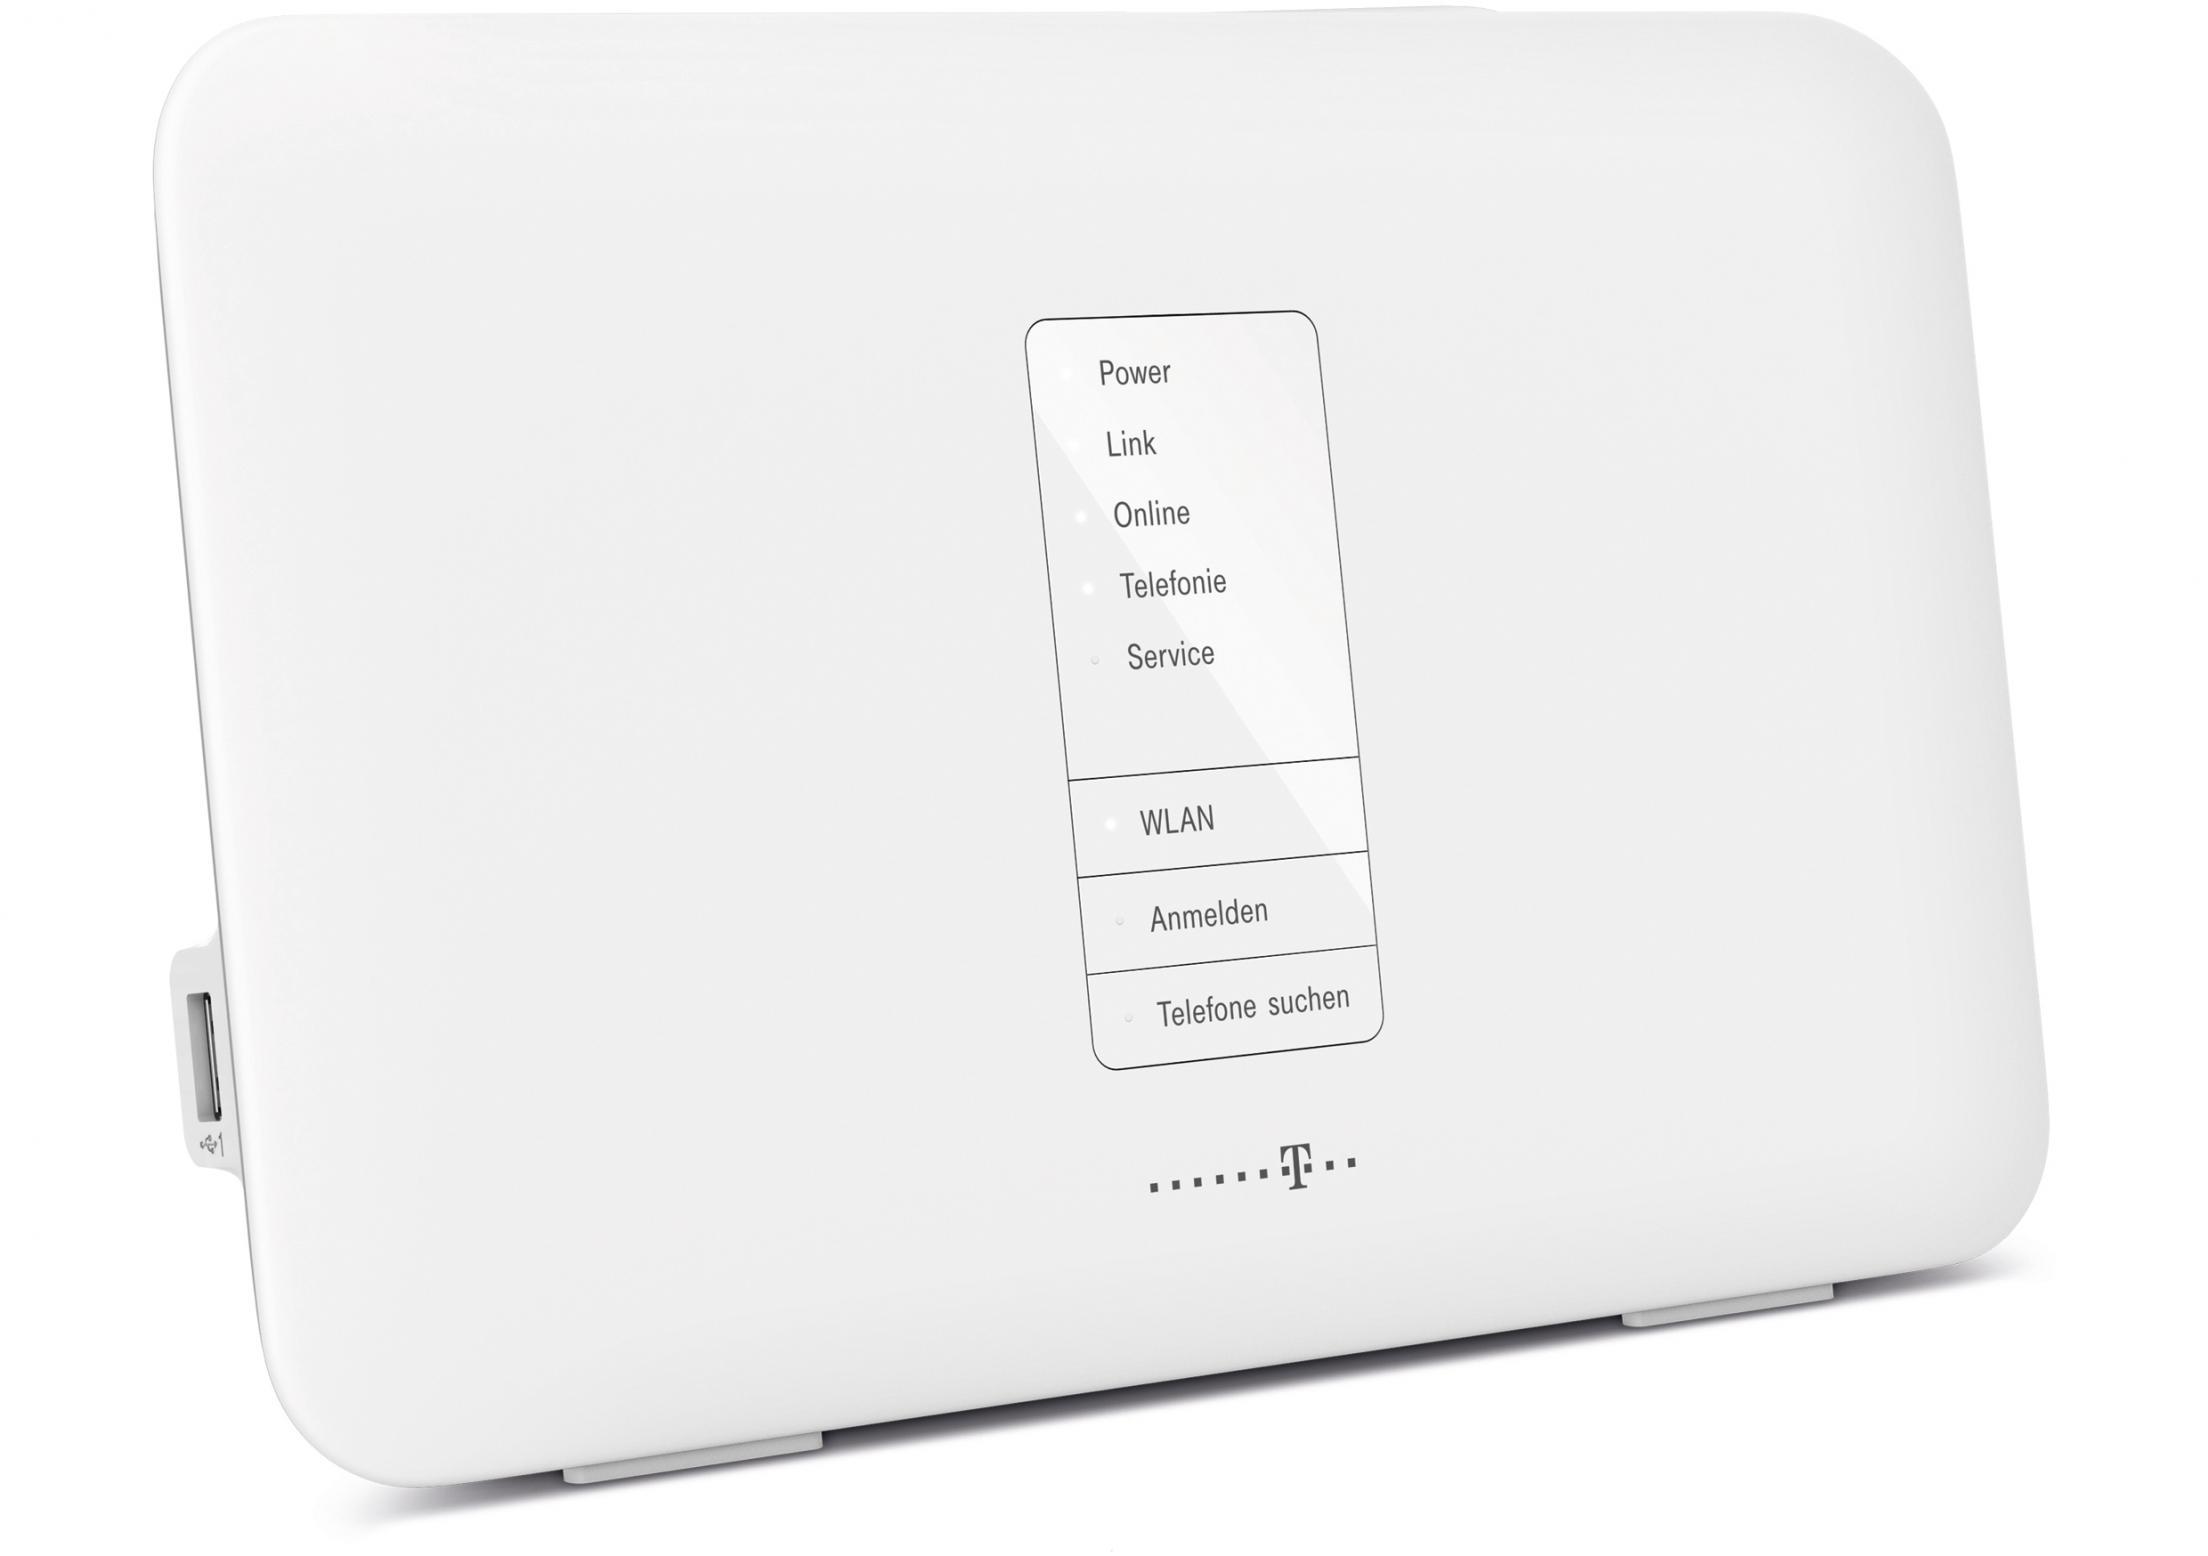 deutsche telekom speedport w 724 v router winner. Black Bedroom Furniture Sets. Home Design Ideas